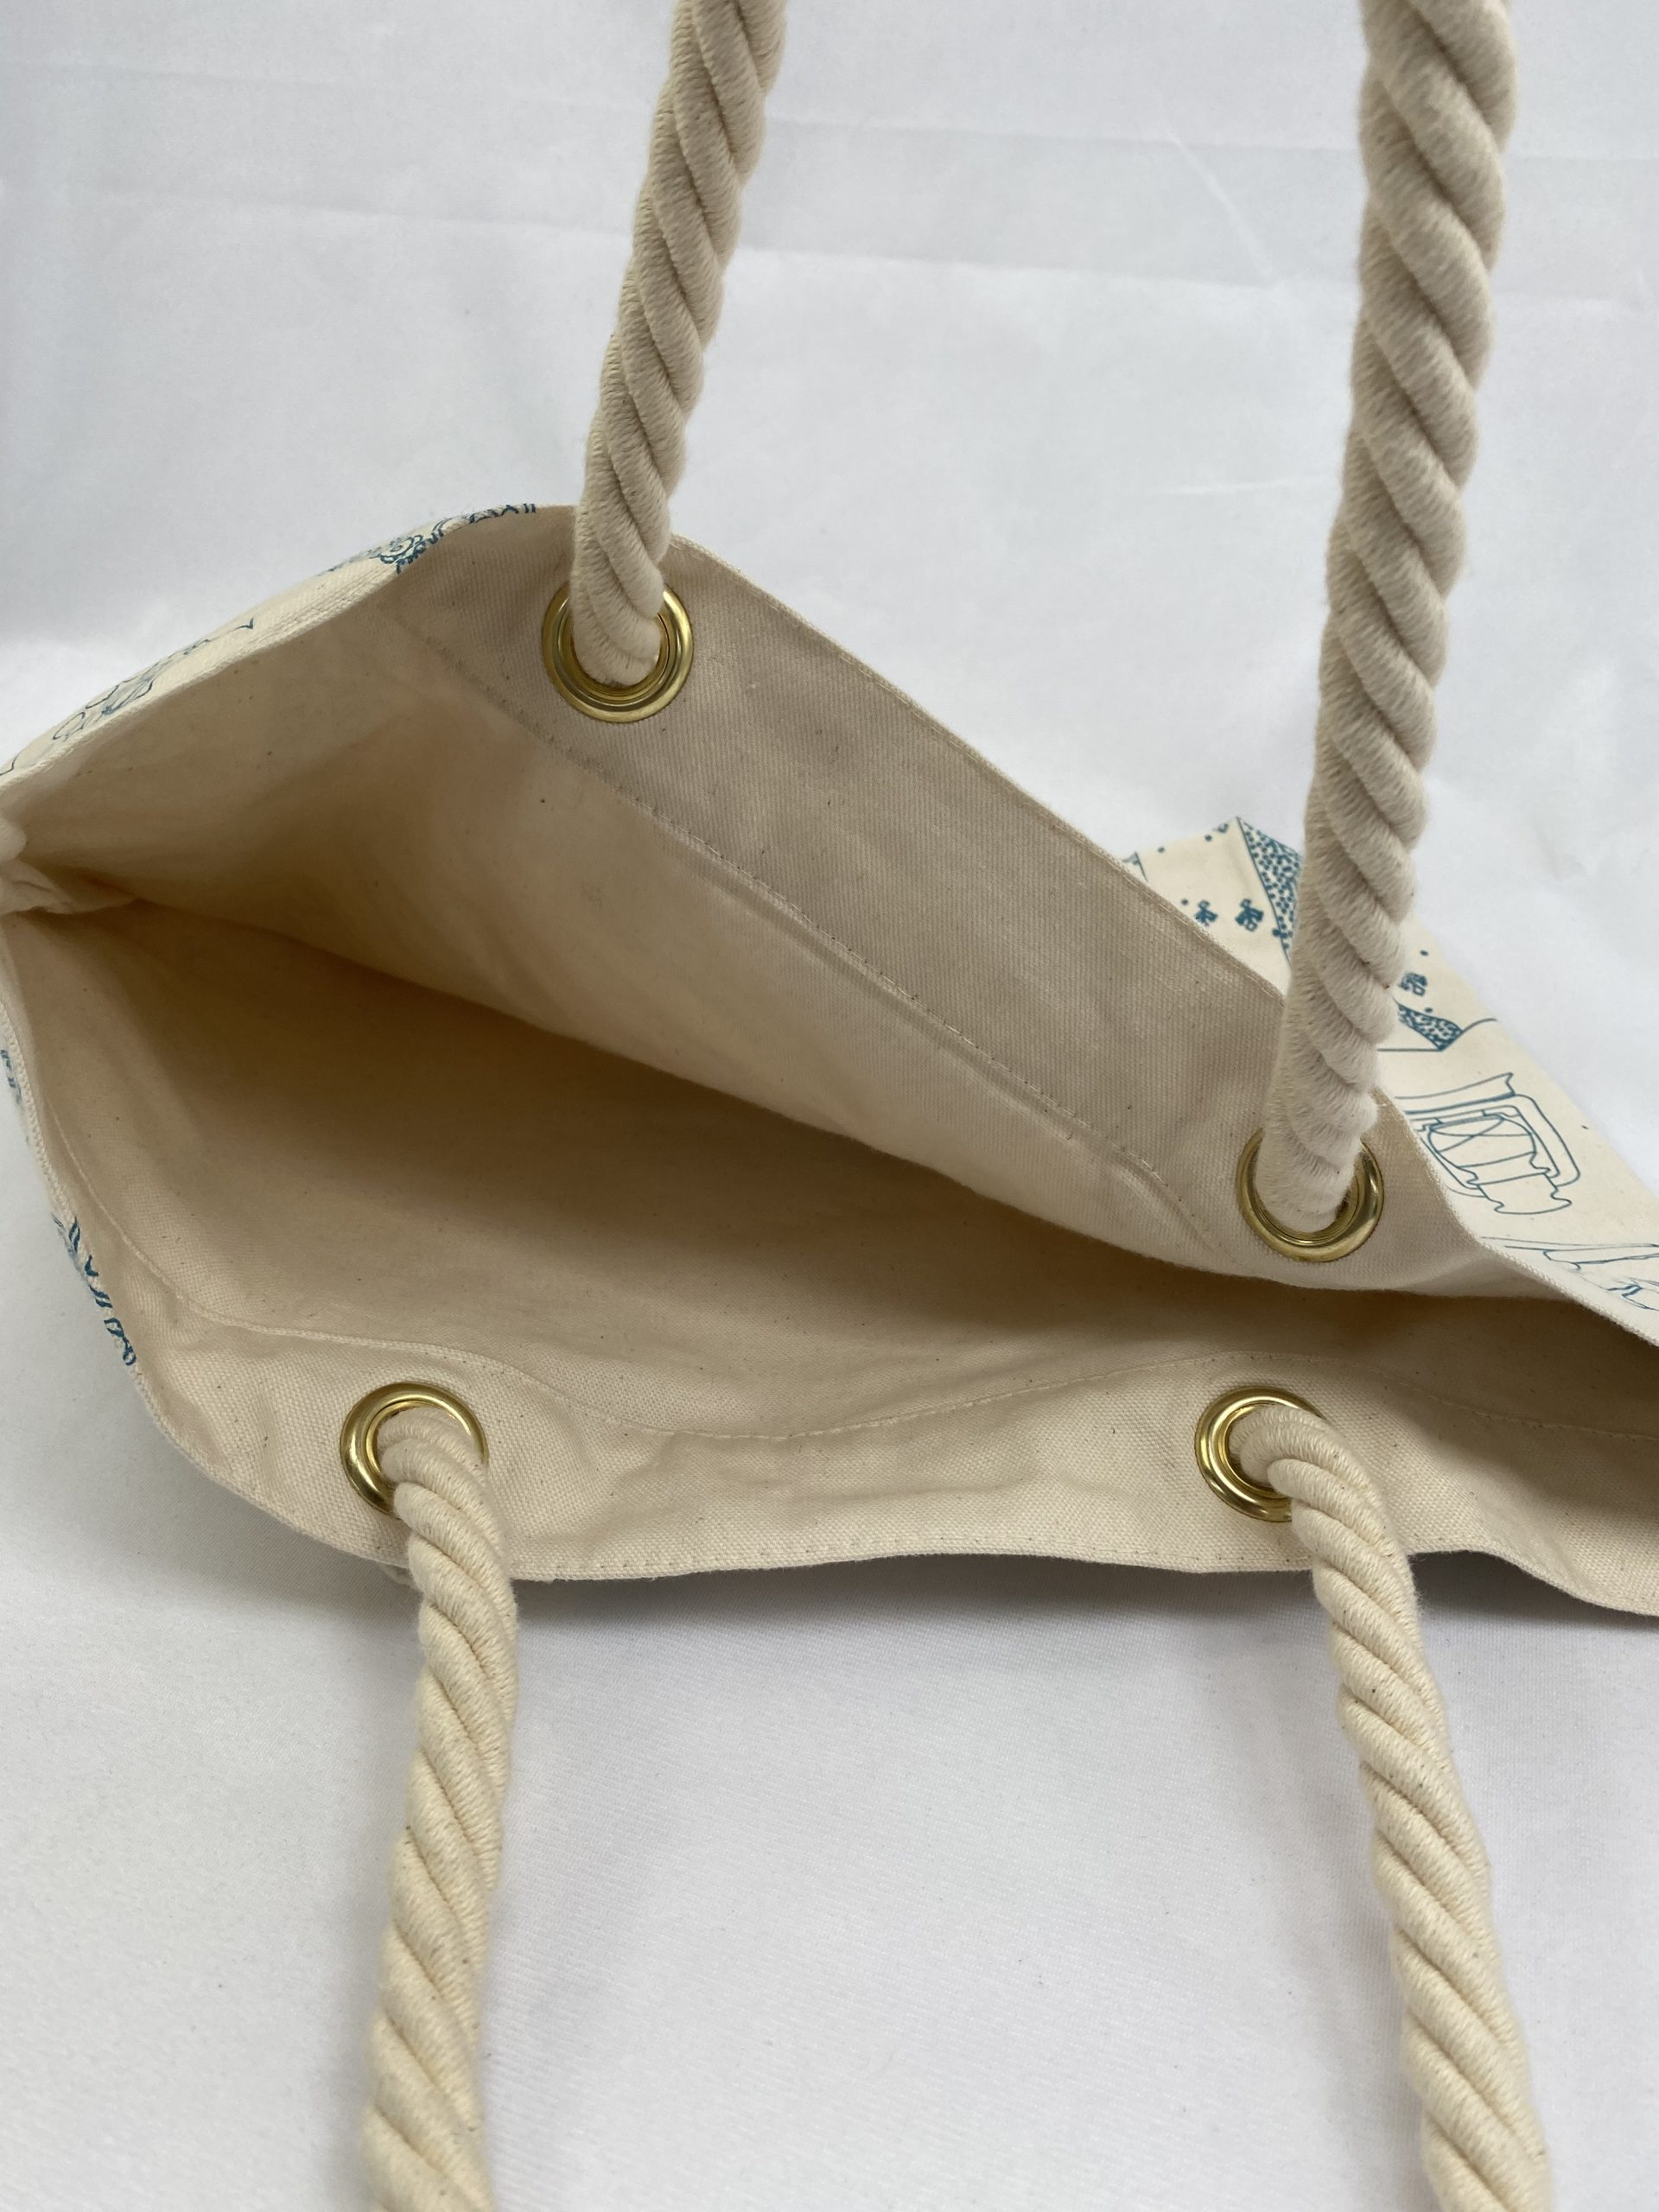 Qatar Musuem Bag with Rope Handles